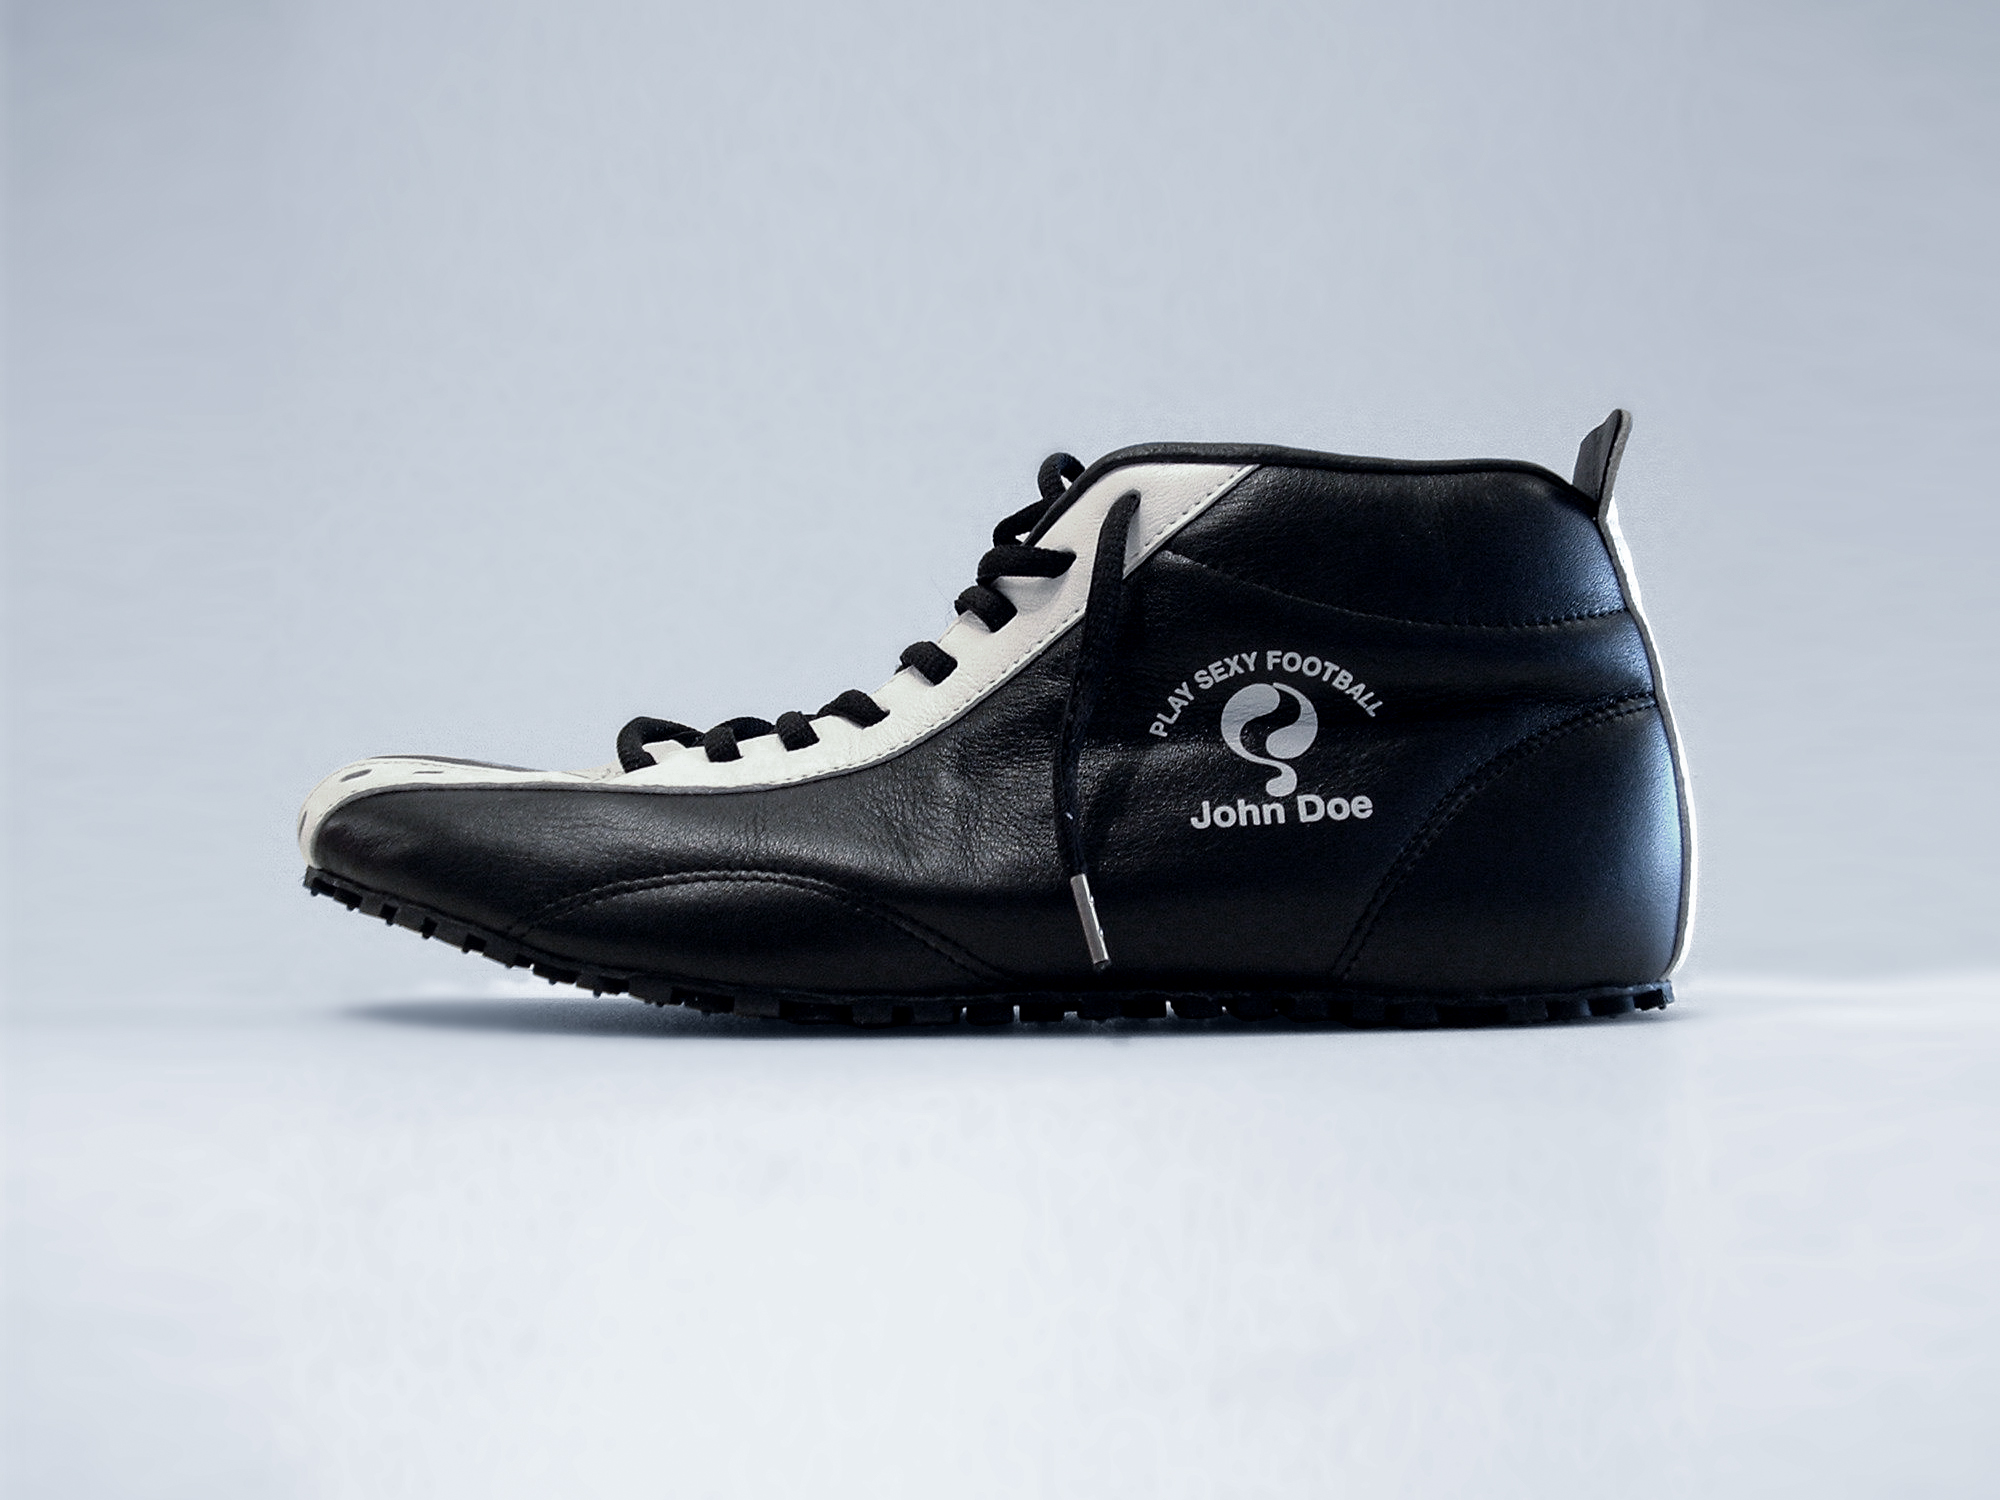 John Doe Shoe